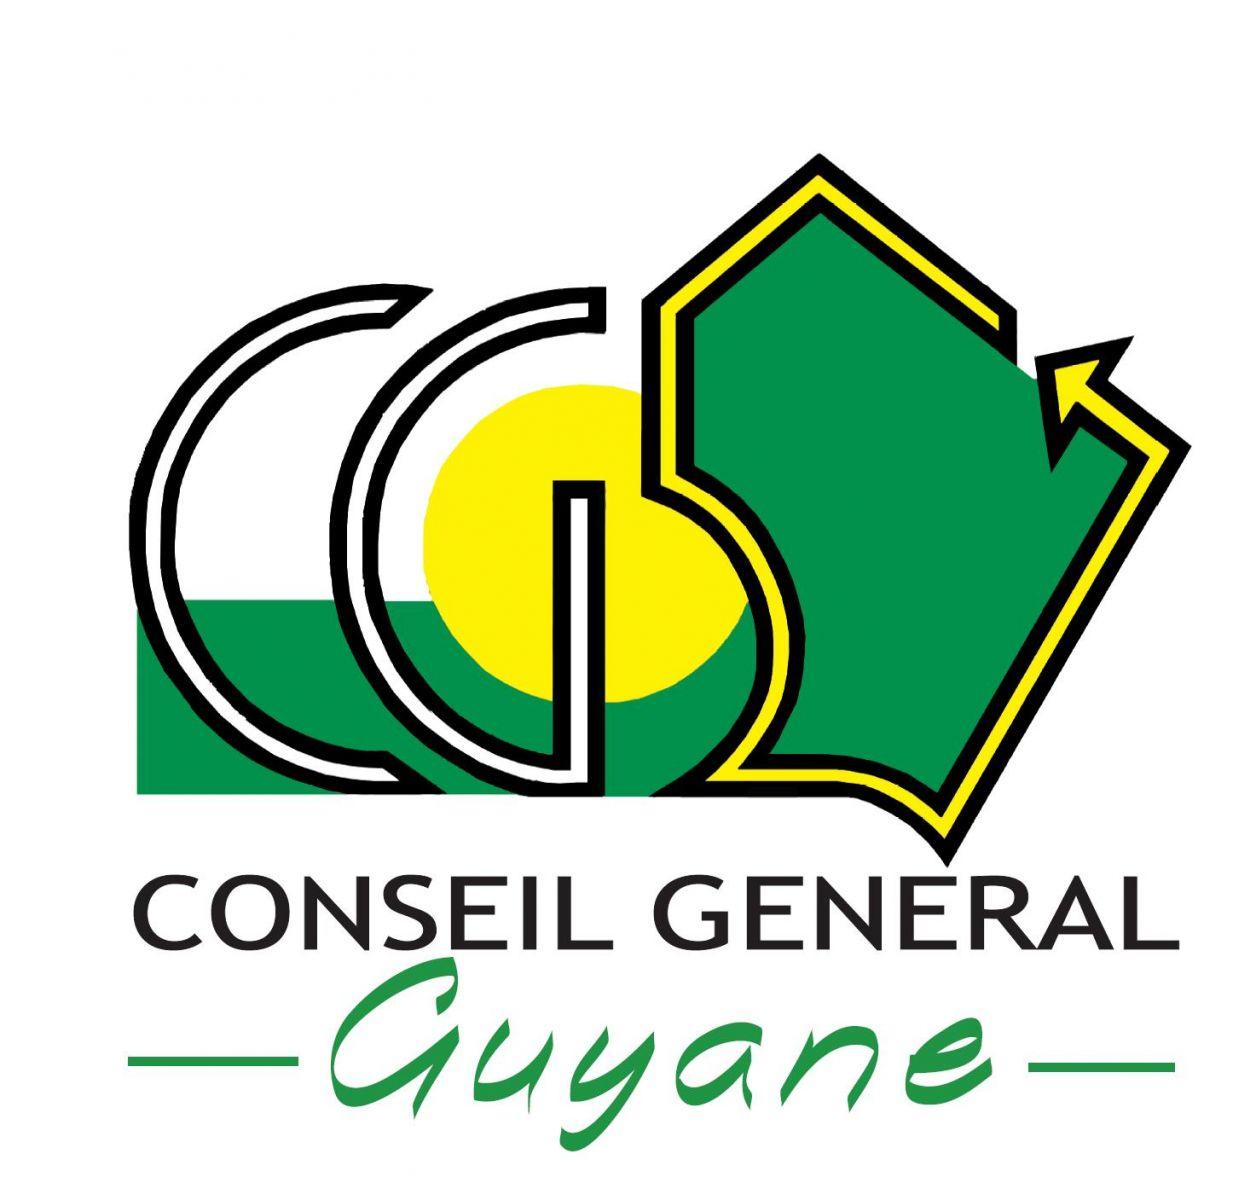 Conseil Général de Guyane